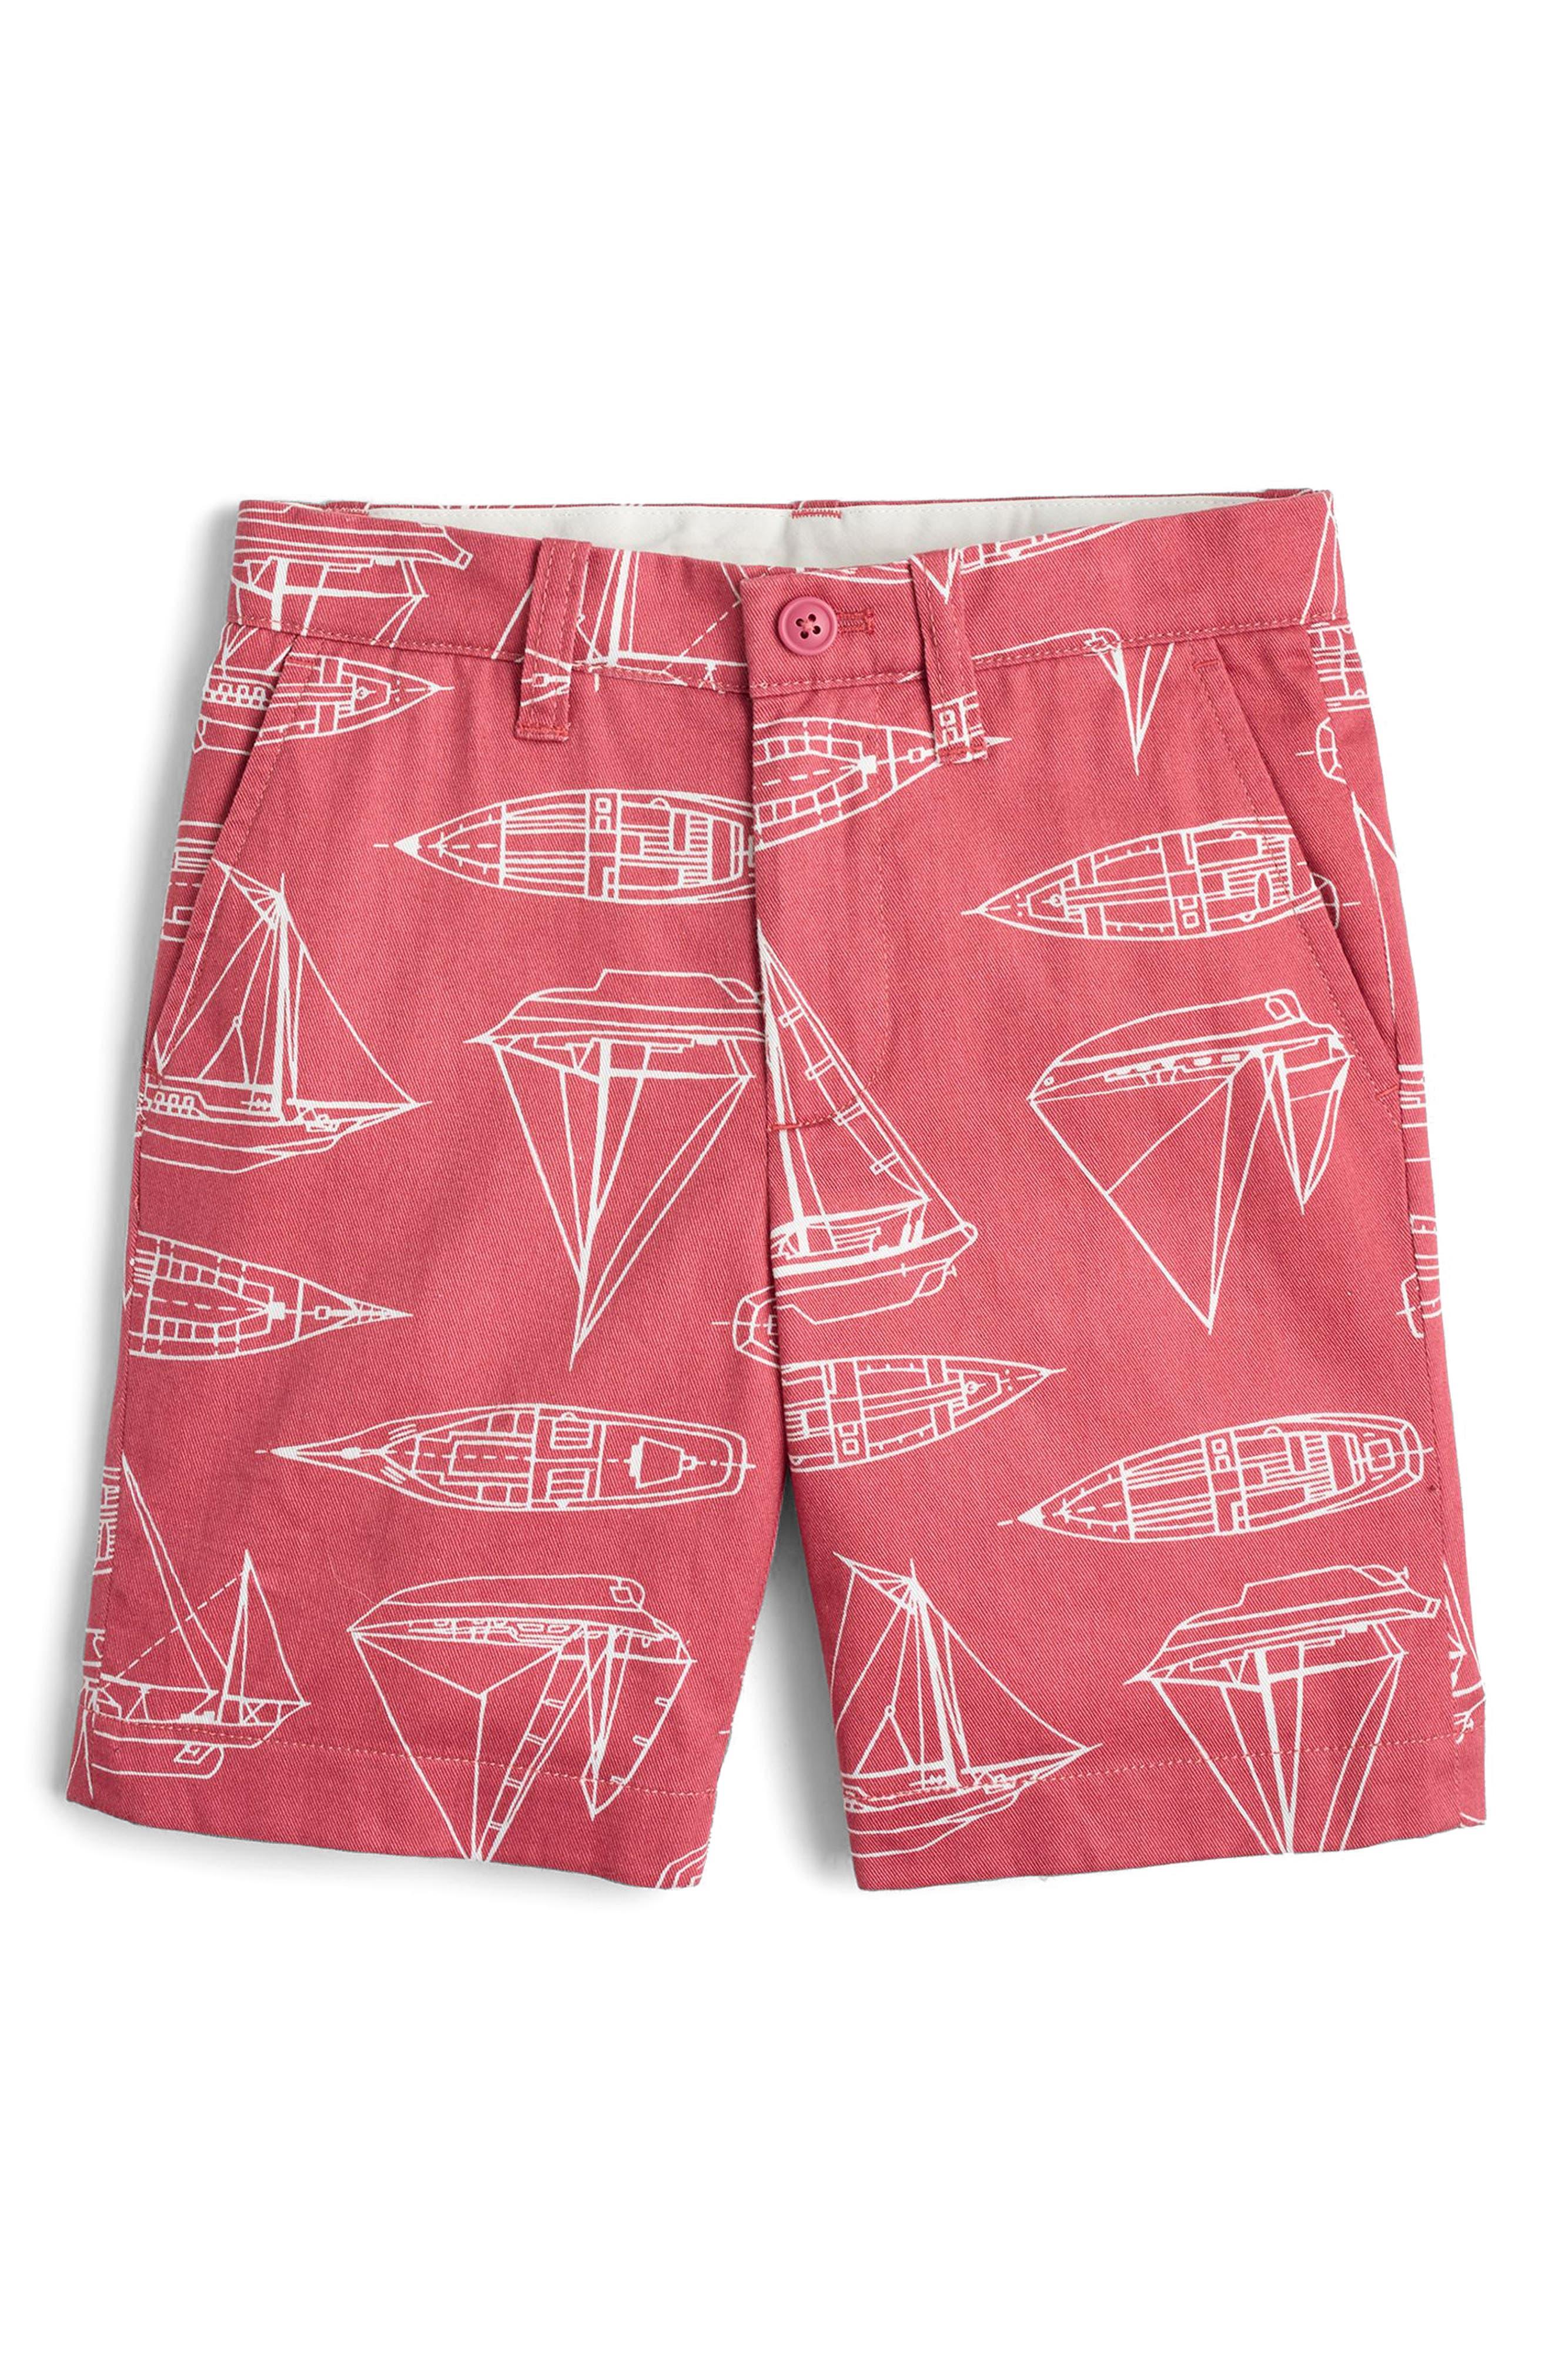 Stanton Boat Print Shorts,                         Main,                         color, 600